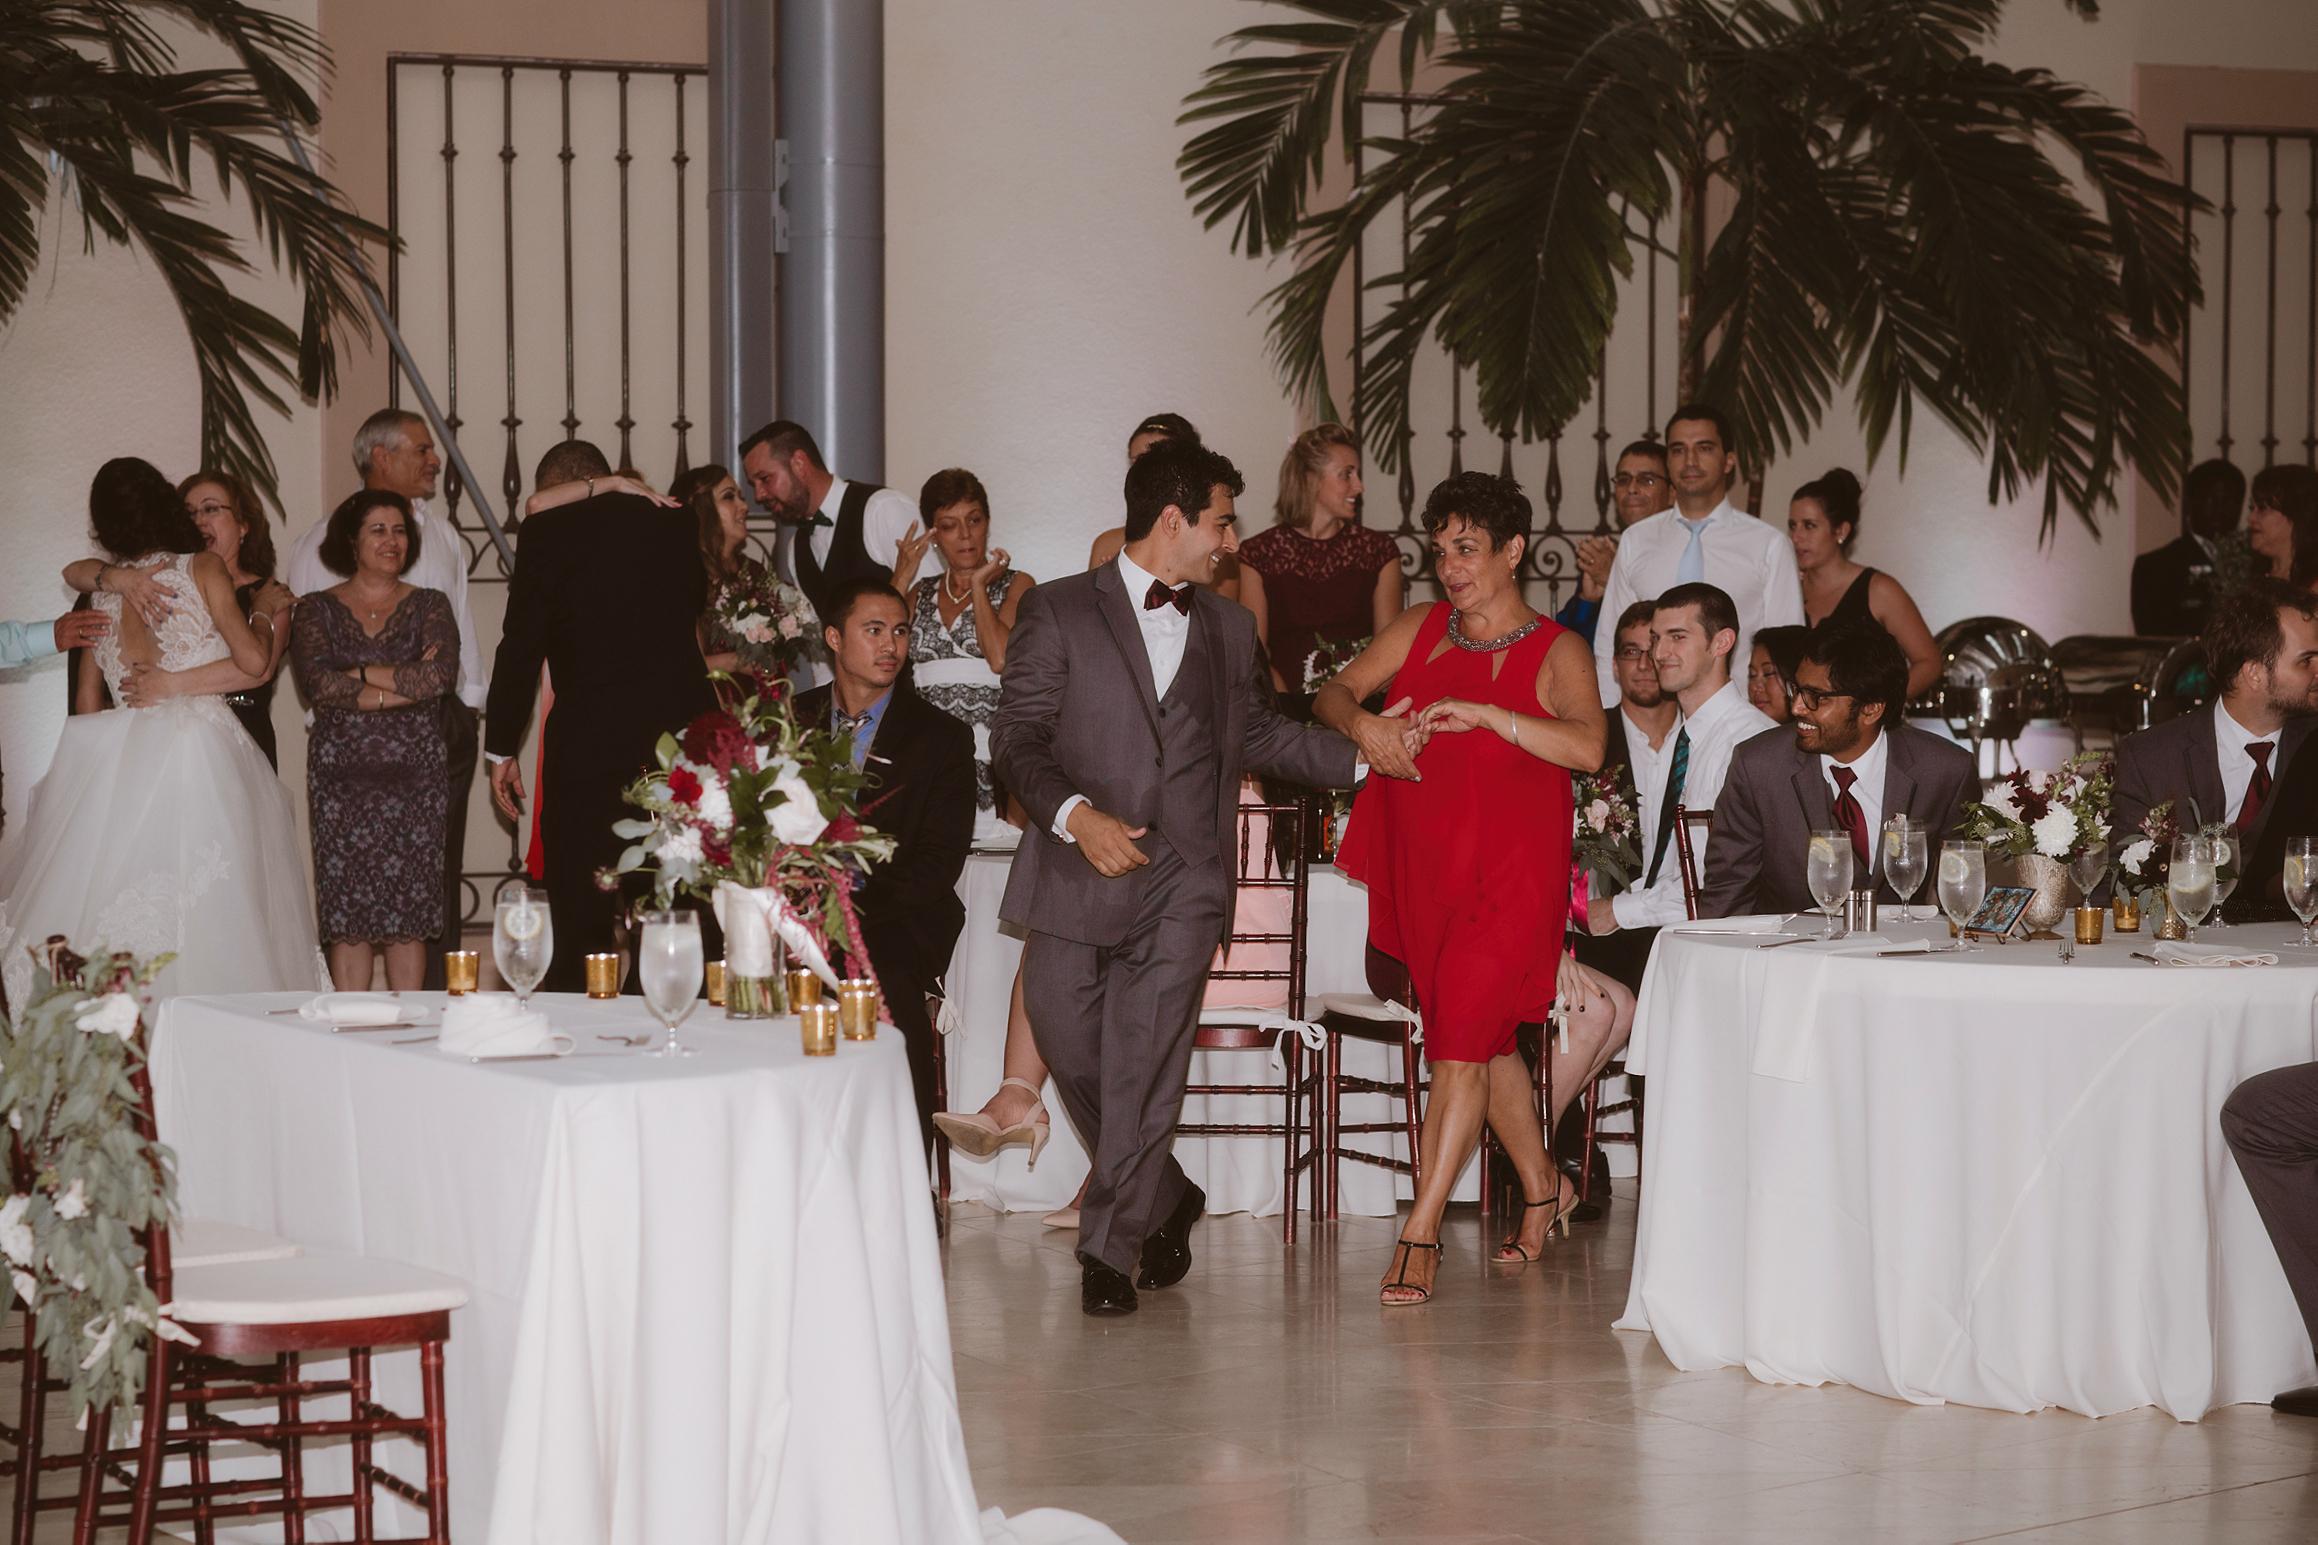 wedding day | MFA St Pete | Vanessa Boy Photography | vanessaboy.com-560.com |final.jpg